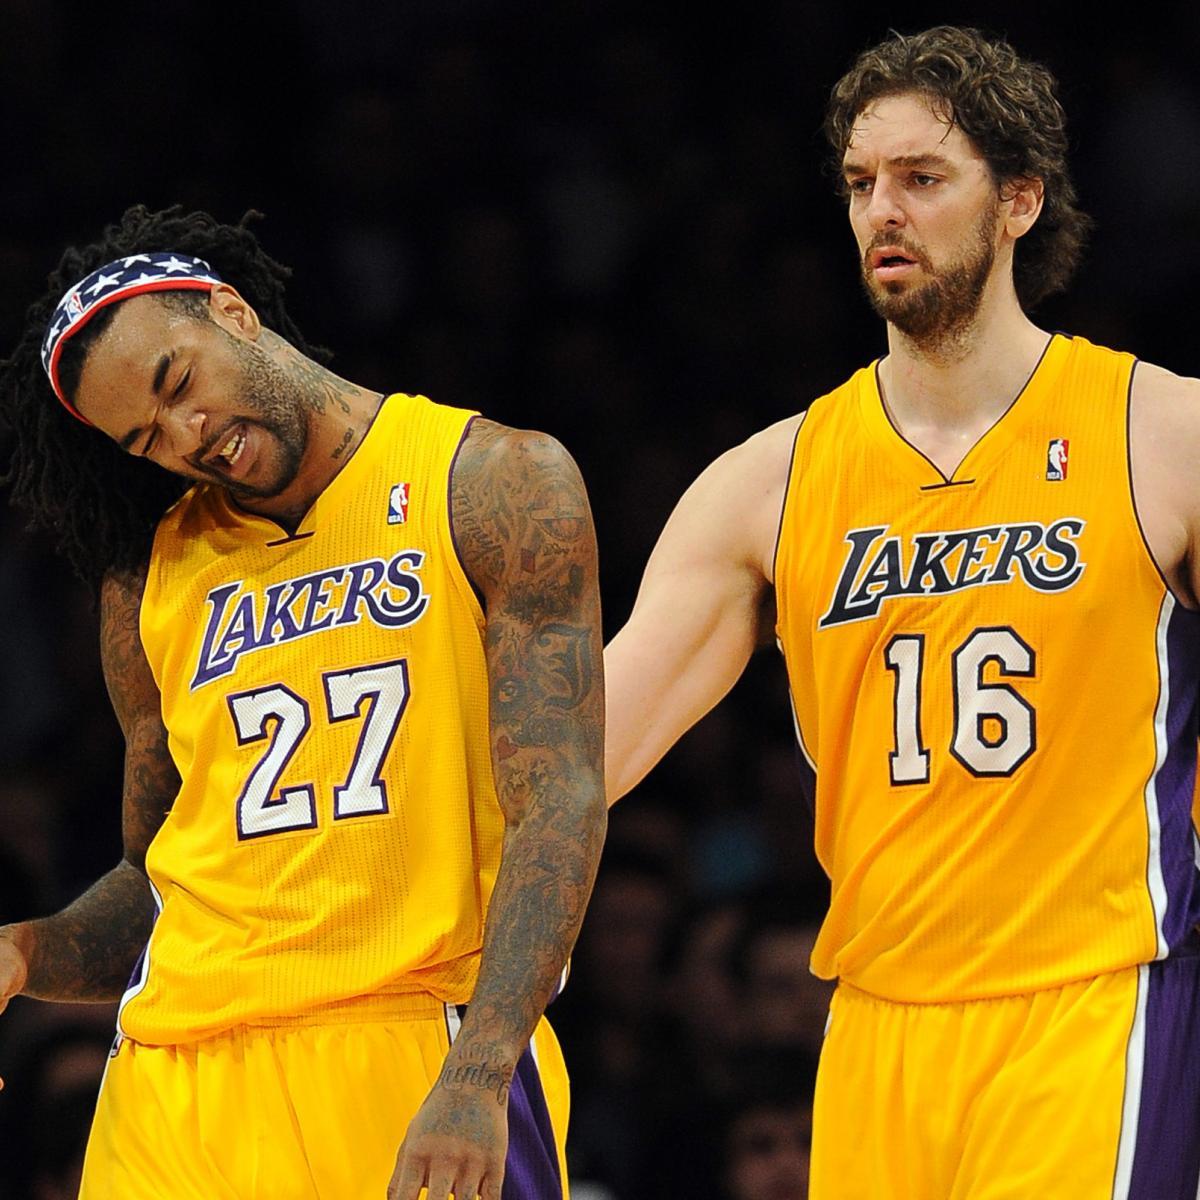 Lakers World16: LA Lakers Cruise Past Warriors In Post-Mike Brown Era